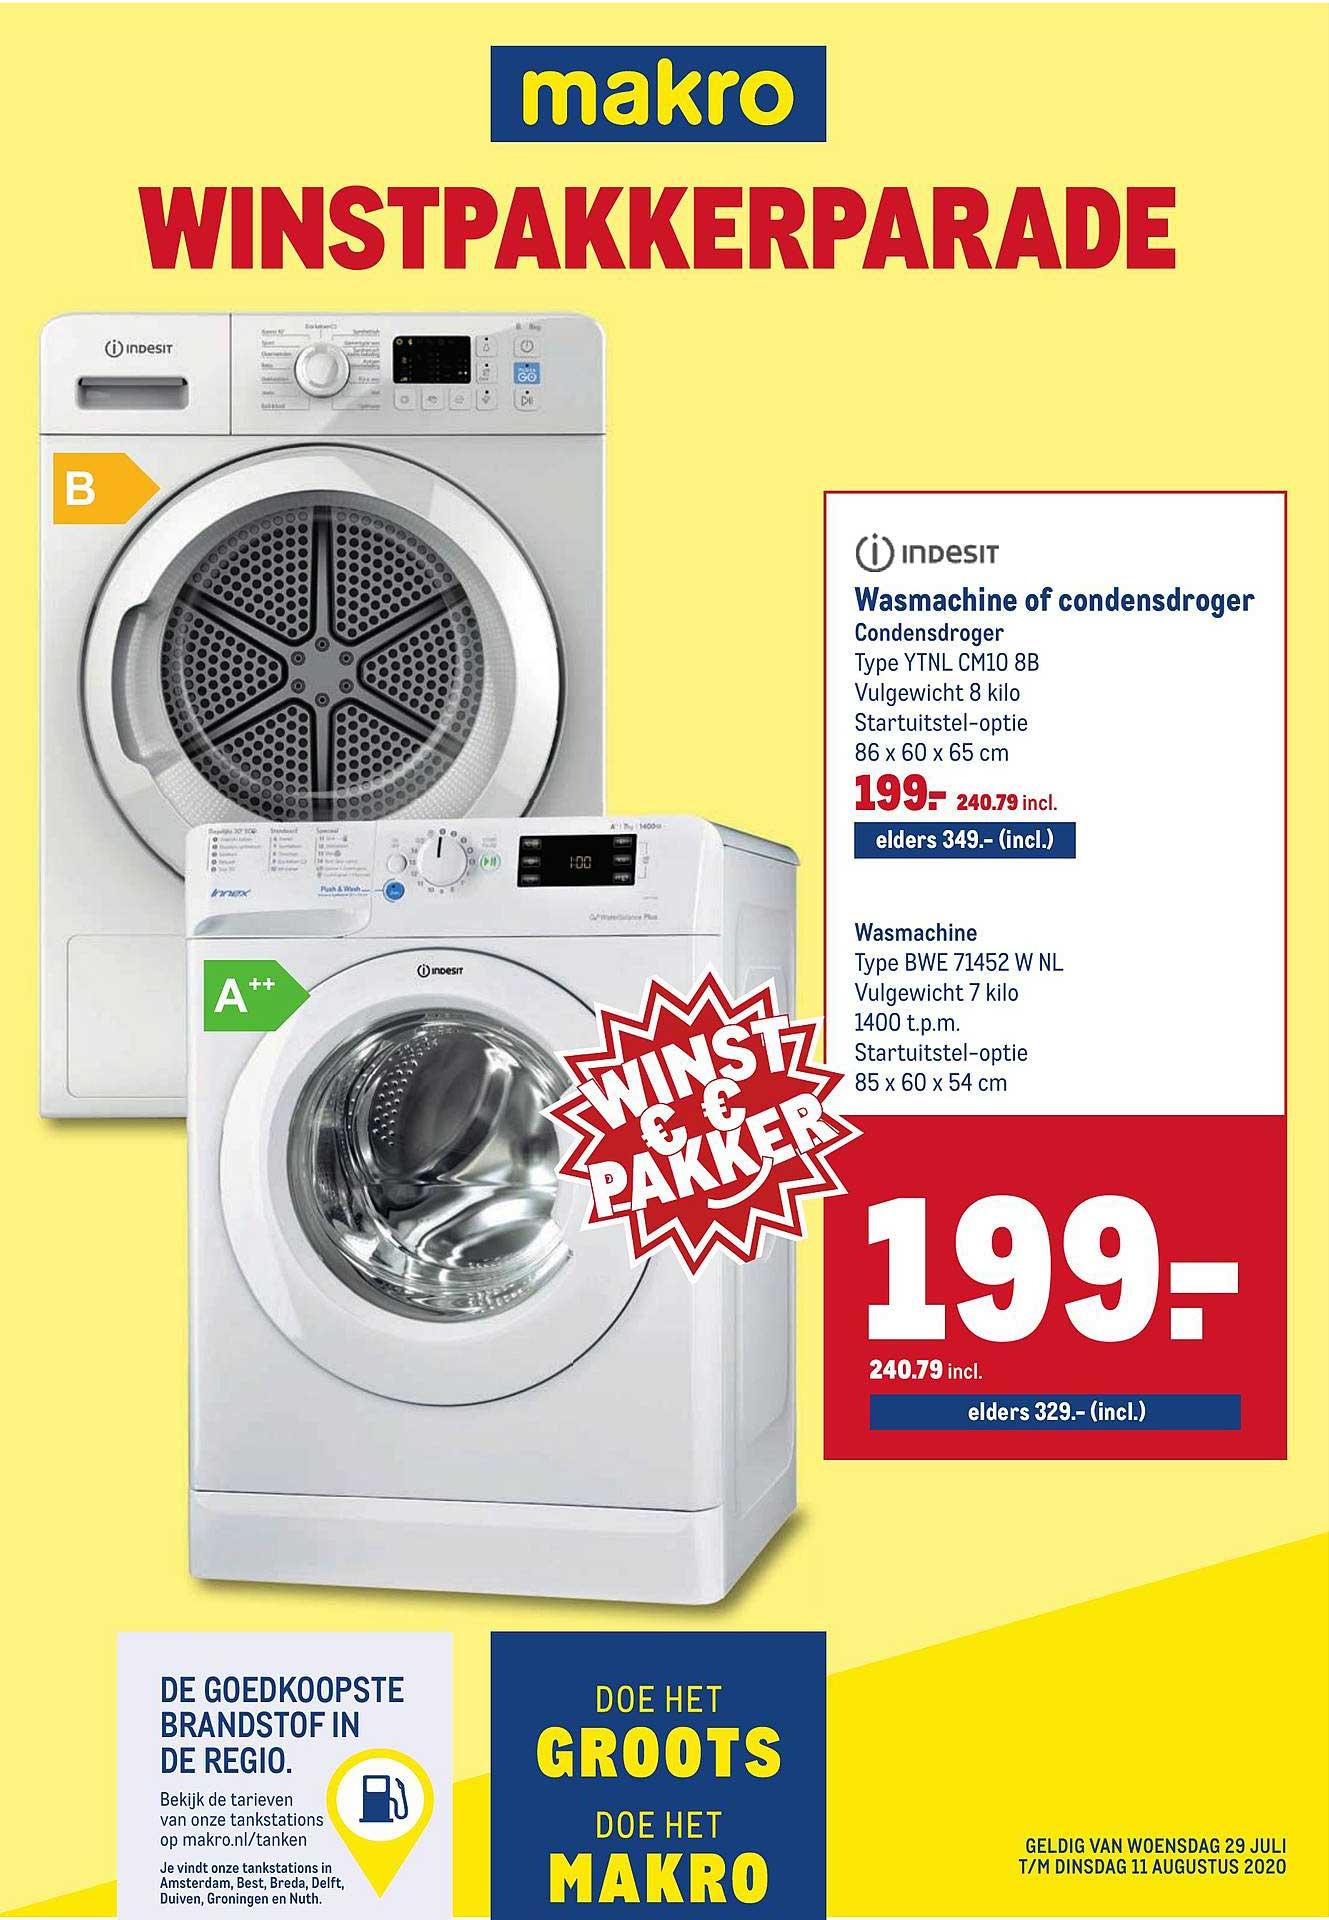 Makro Indesit Wasmachine Of Condensdroger